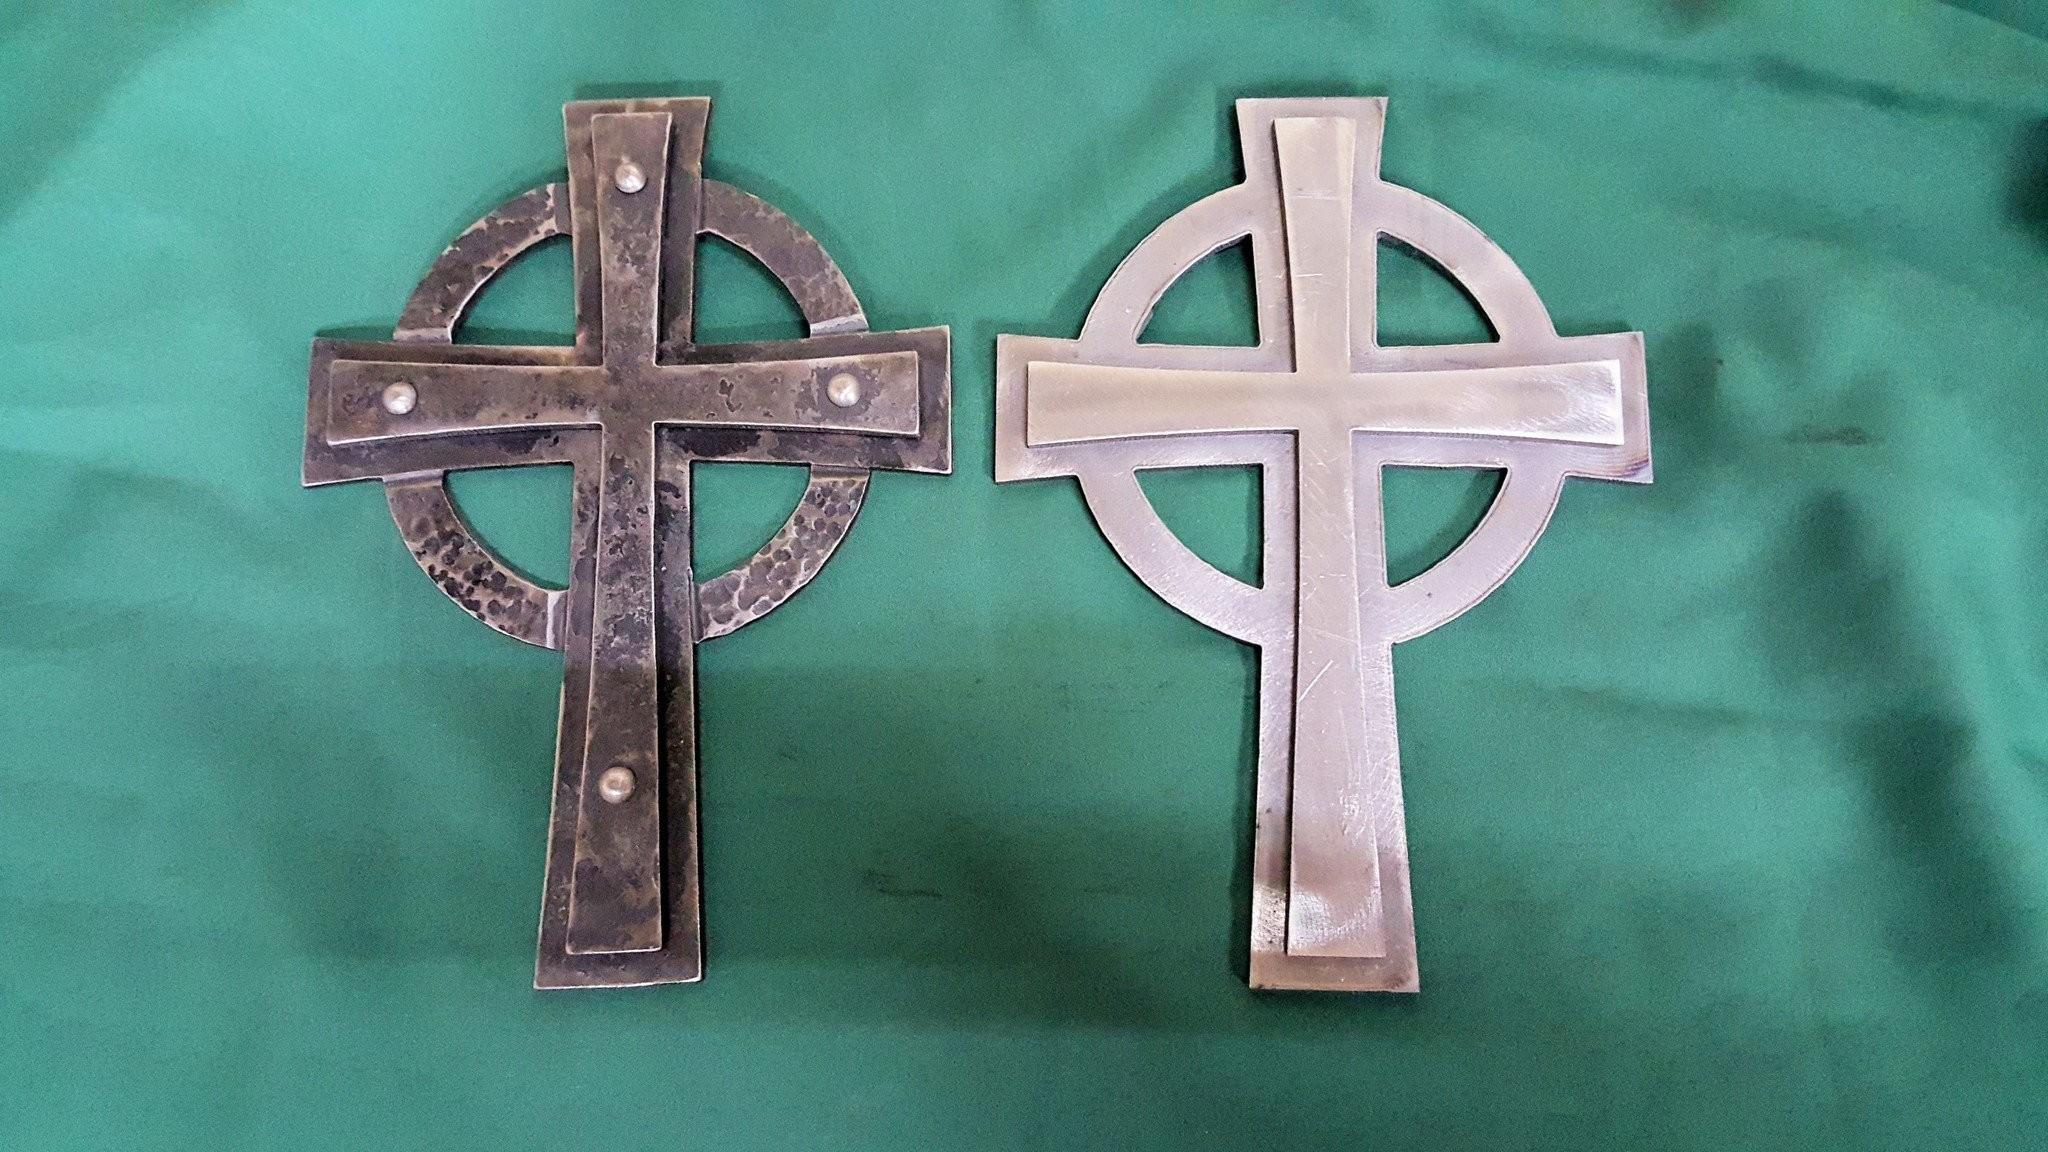 Res: 2048x1152, Celtic Cross Project, Blacksmithing- Ken's Custom Iron Store, www.